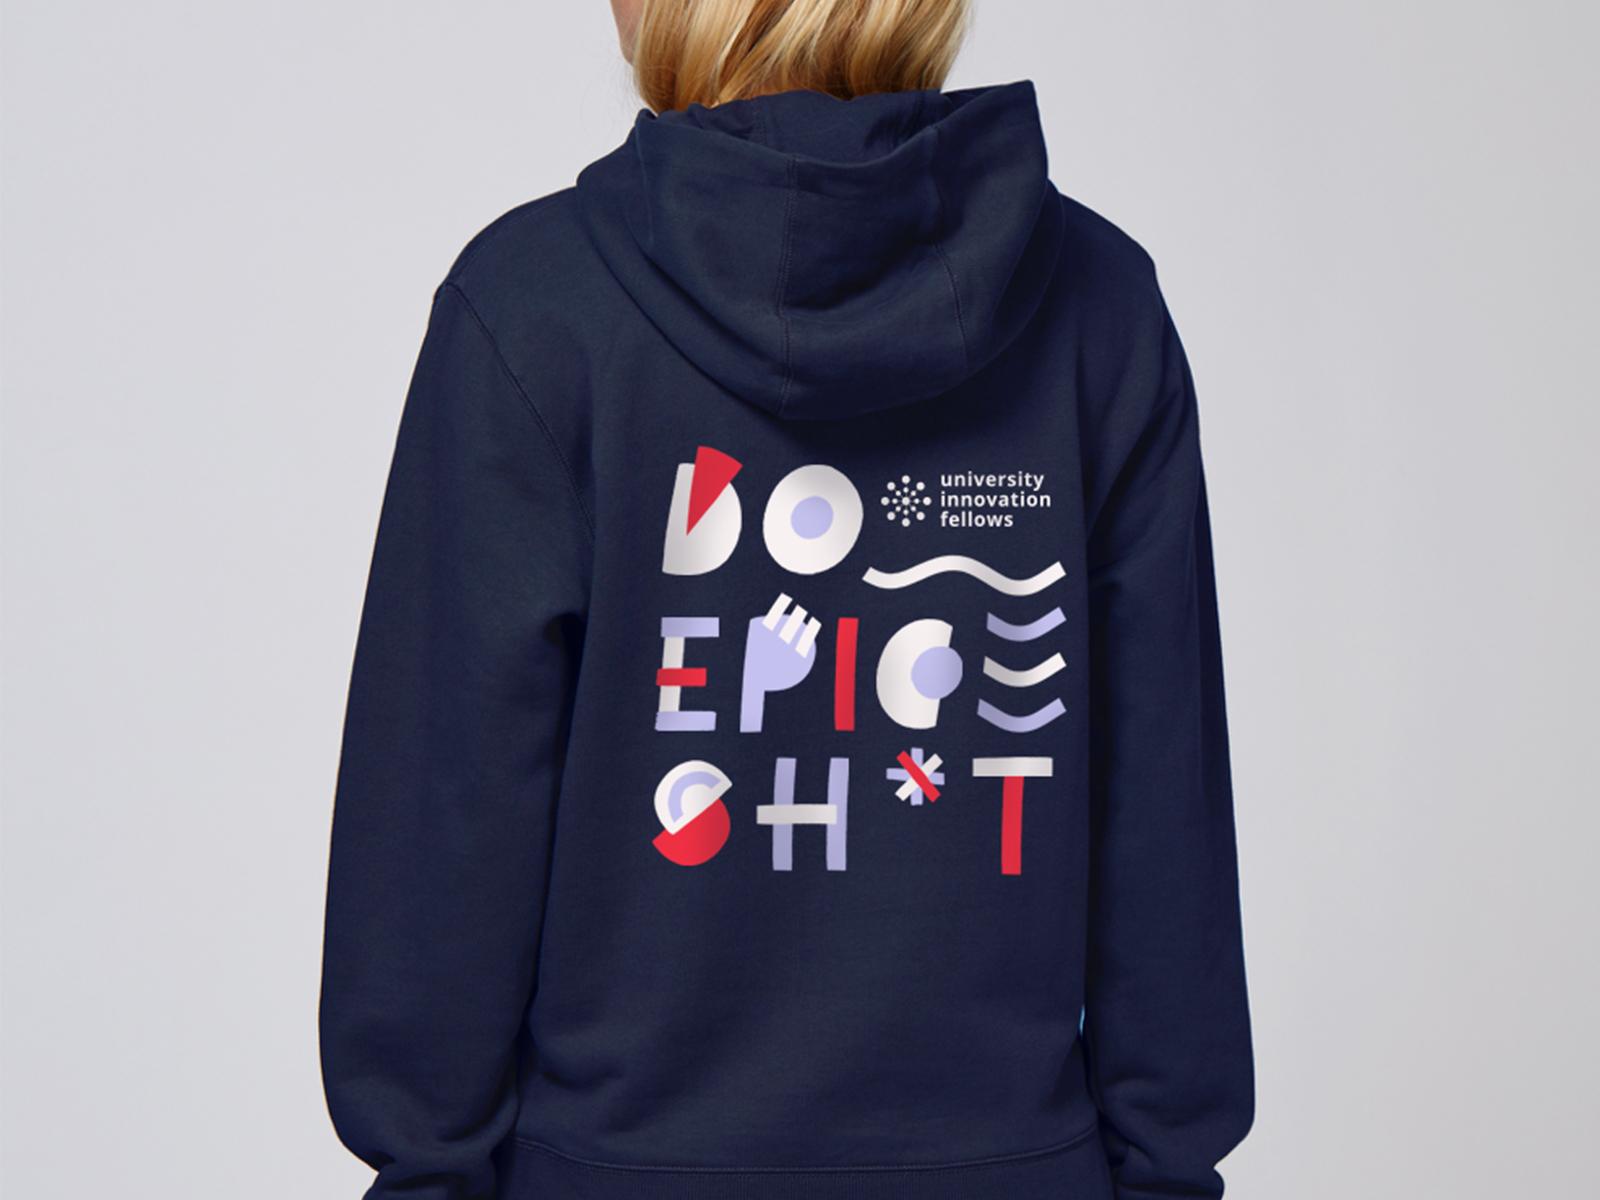 do-epic-sht-hoodie